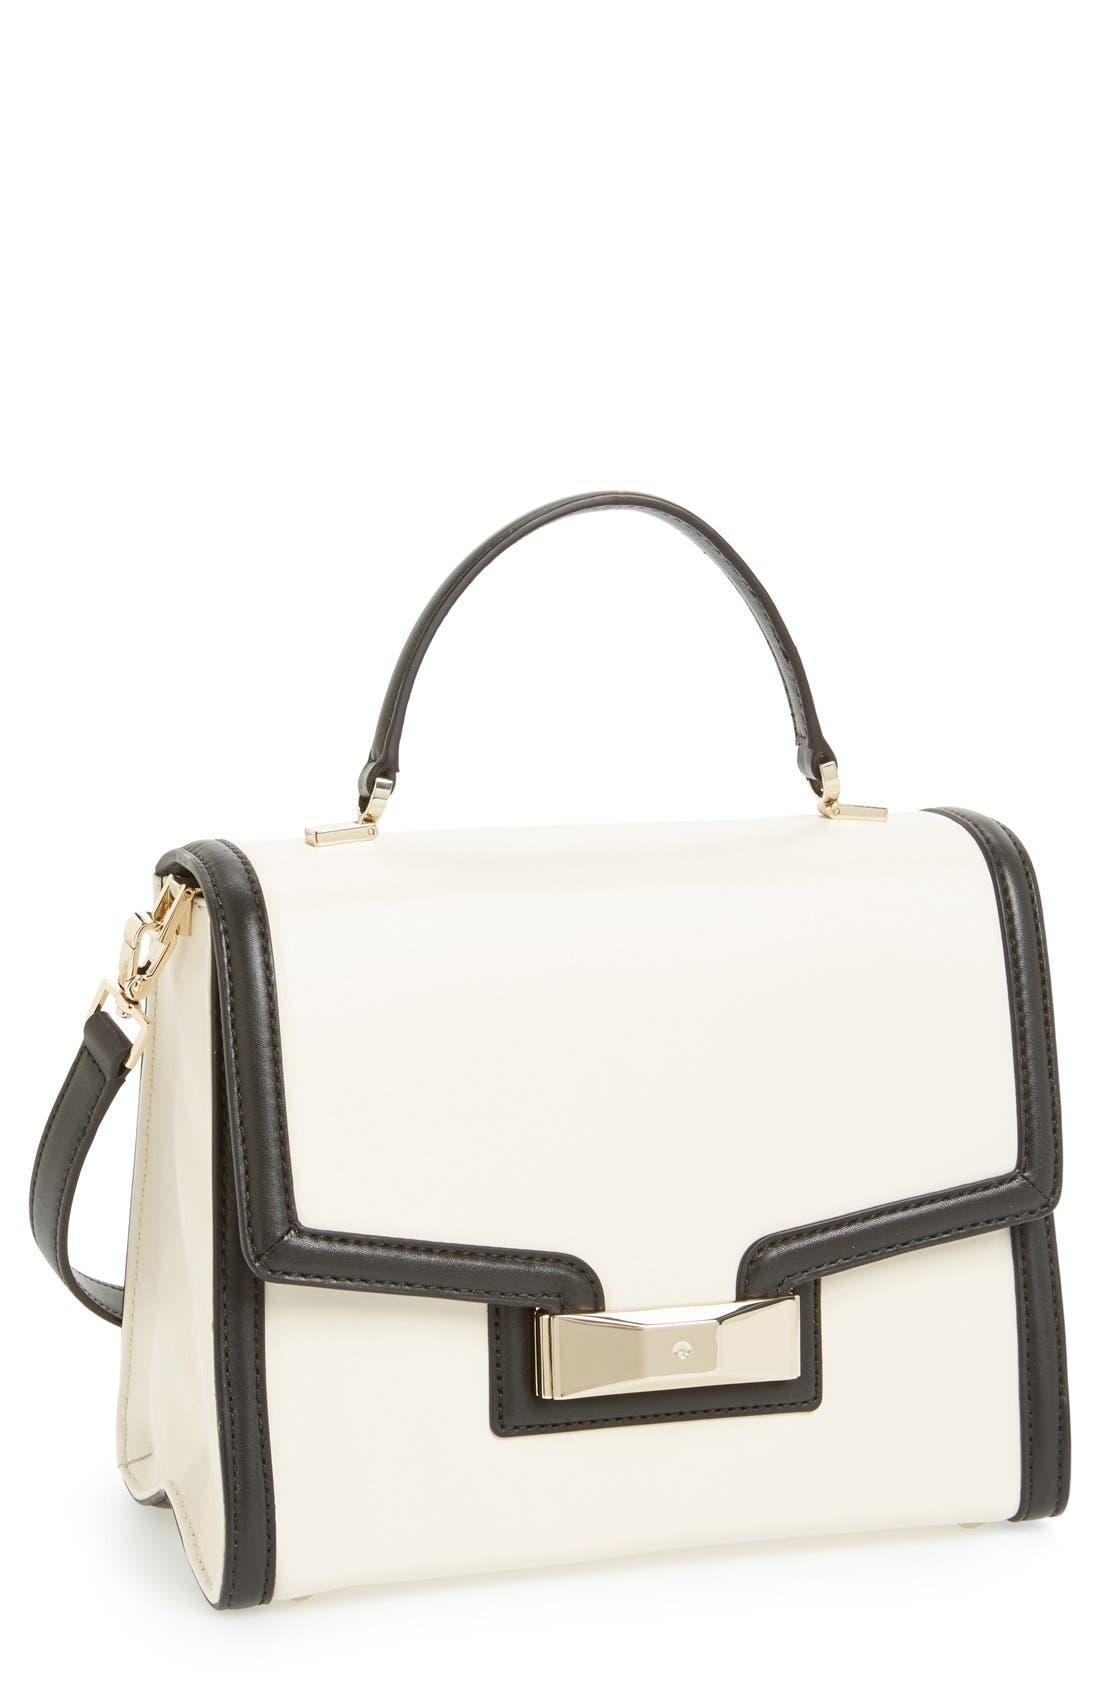 Main Image - kate spade new york 'carroll park - penelope' leather satchel